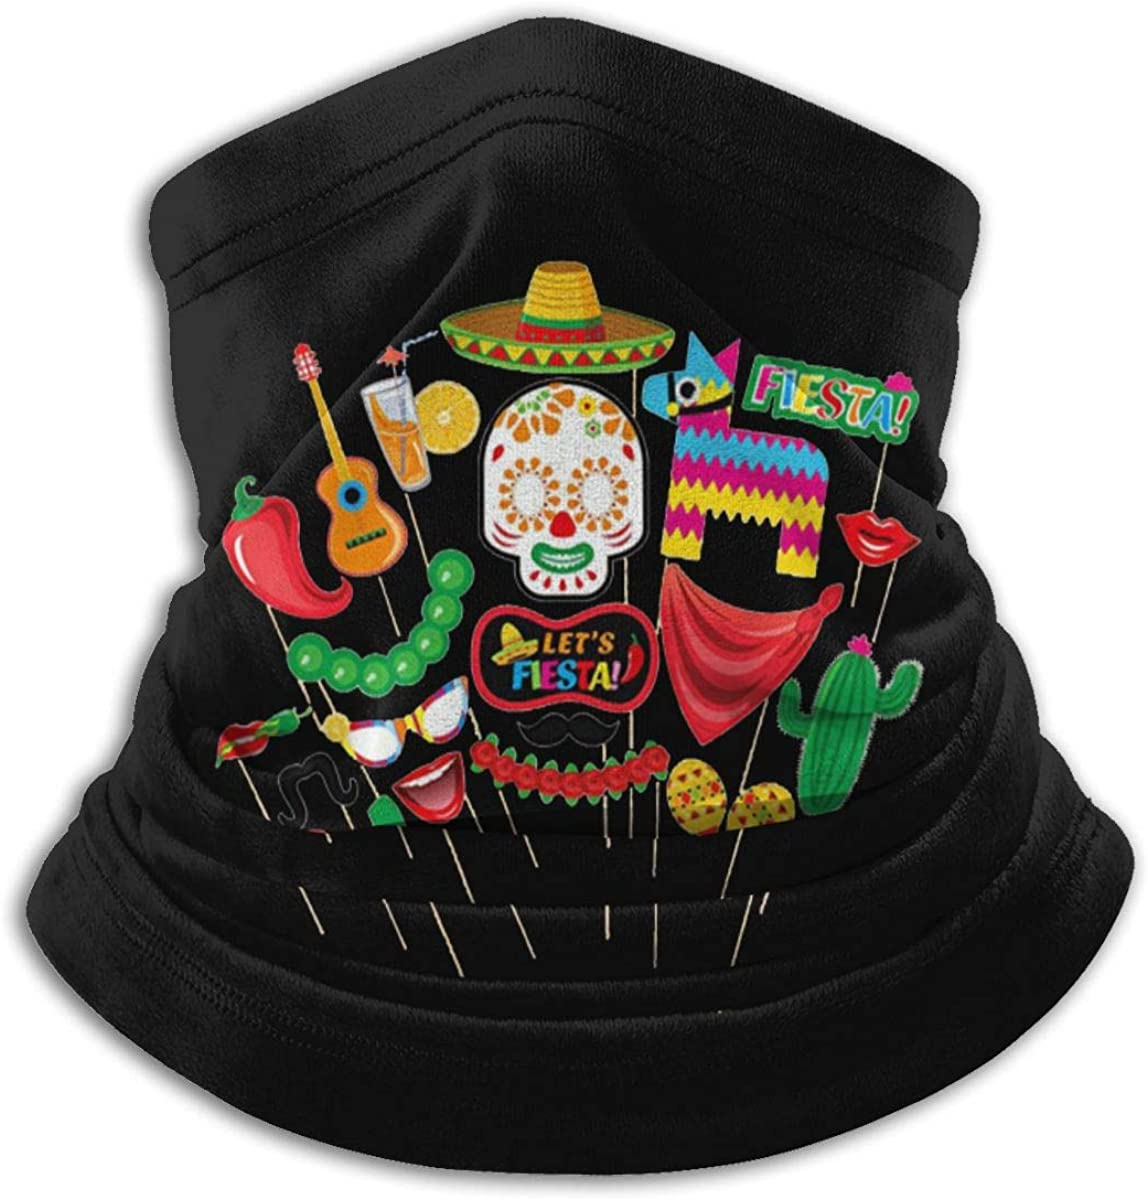 Cinco De Mayo Black Multi-function Neck Warmer Gaiter Polyester Neck Warmer Windproof Winter Neck Gaiter Cold Weather Scarf For Men Women